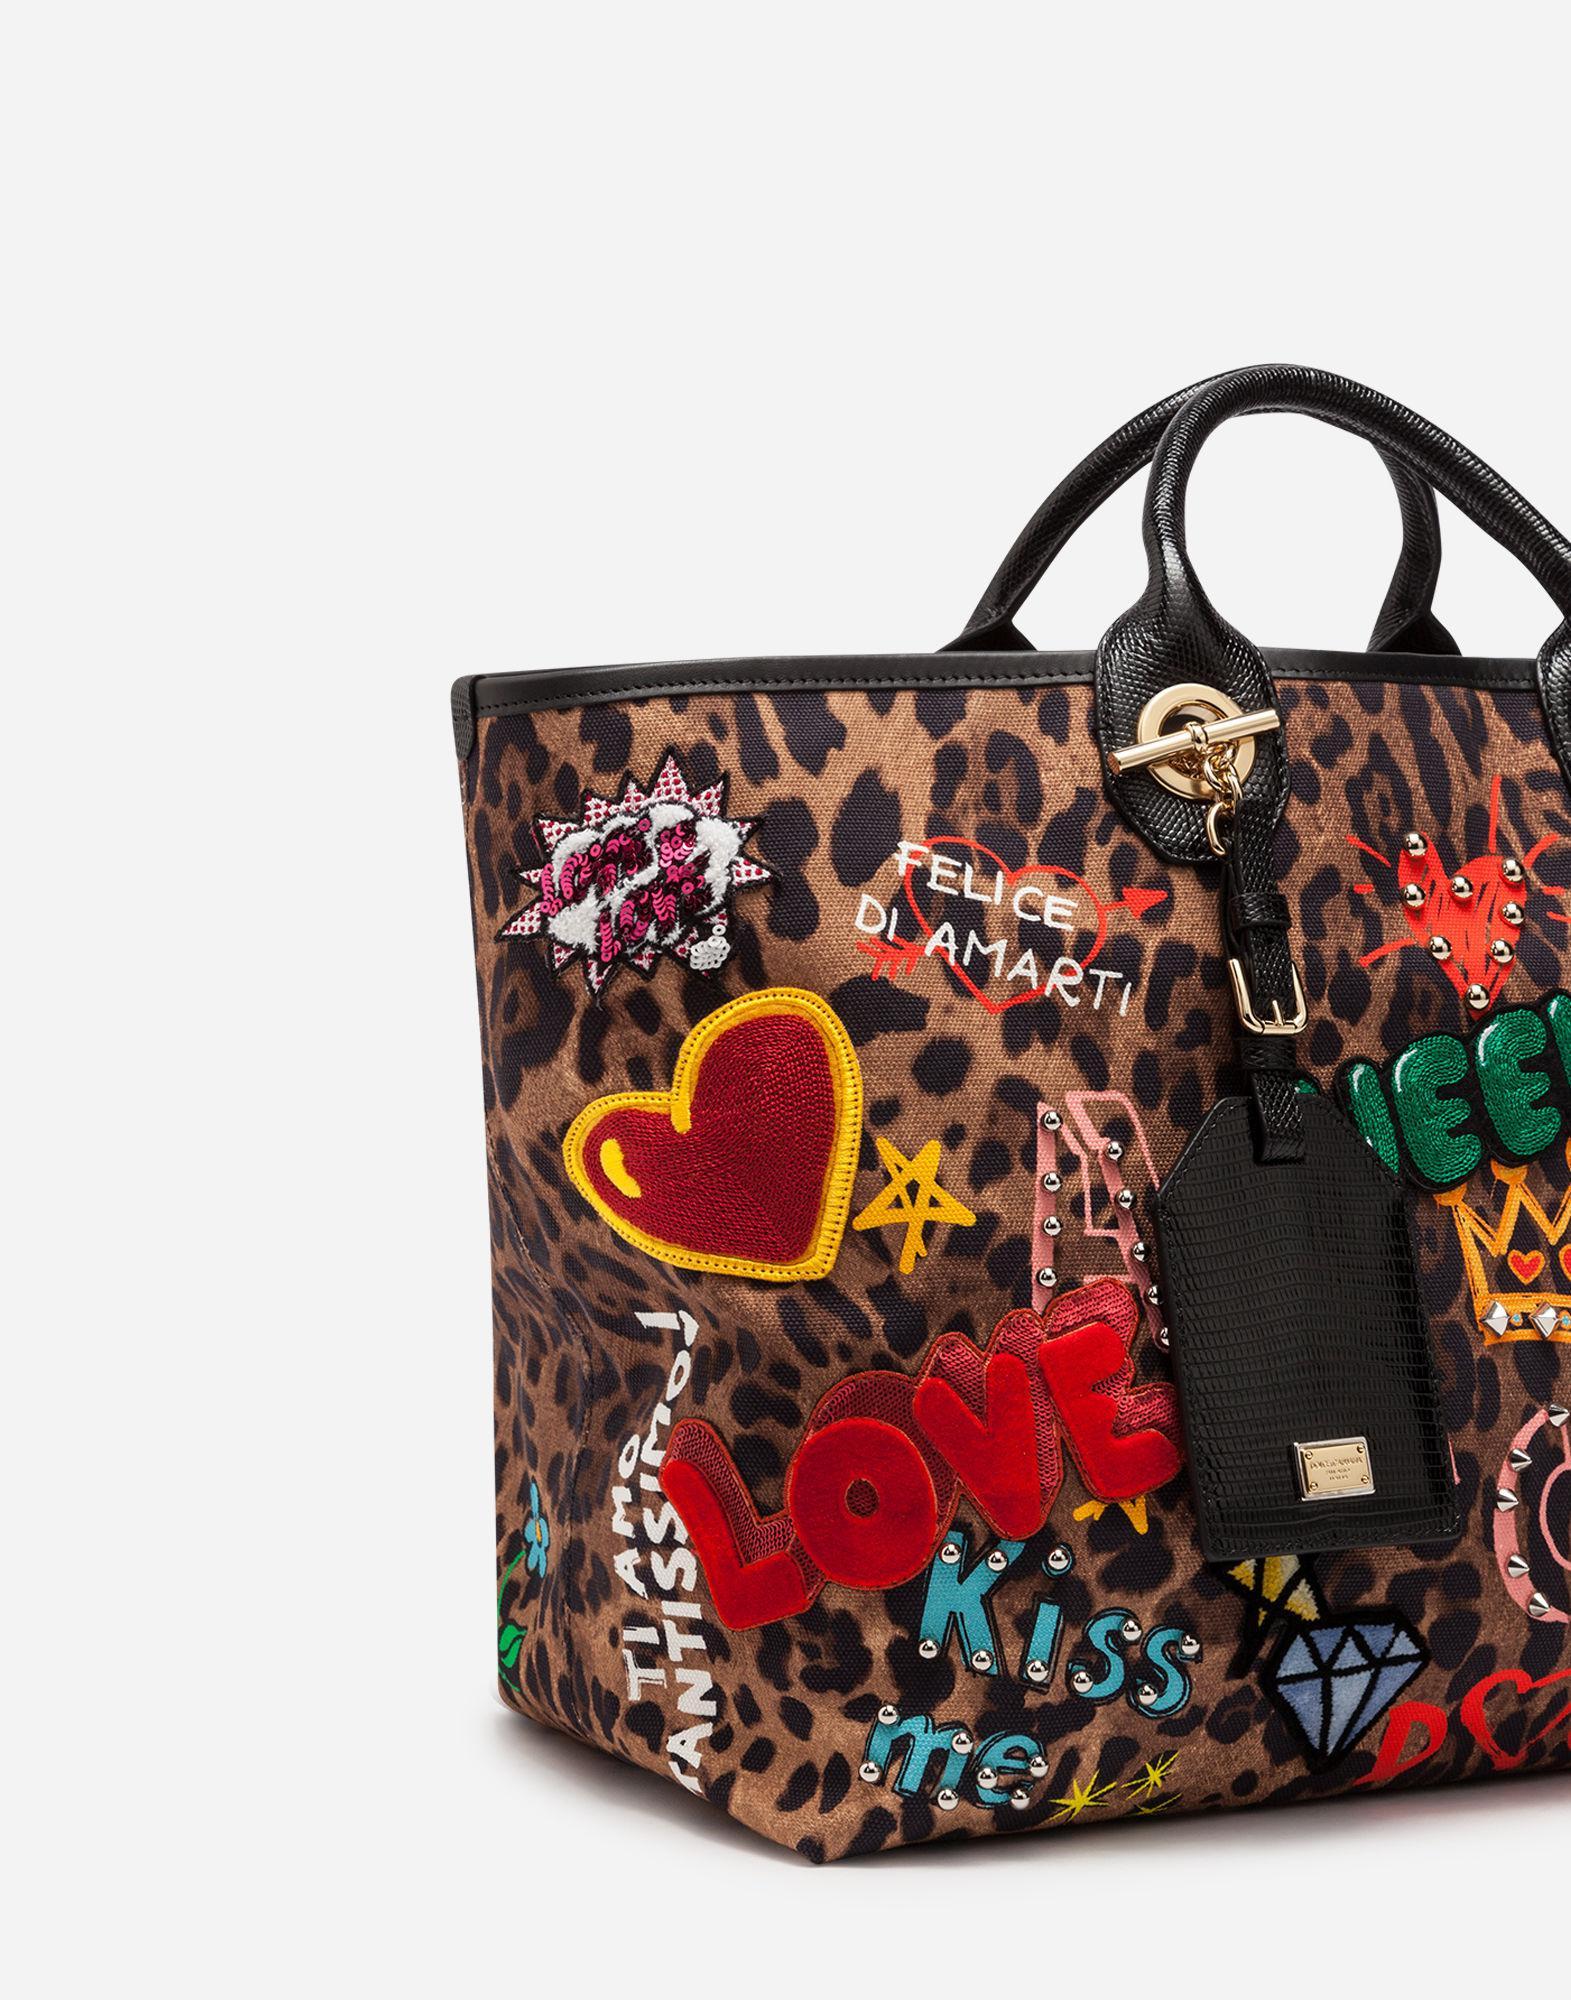 35b4820890 Lyst - Dolce   Gabbana Capri Shopping Bag In Printed Fabric And ...